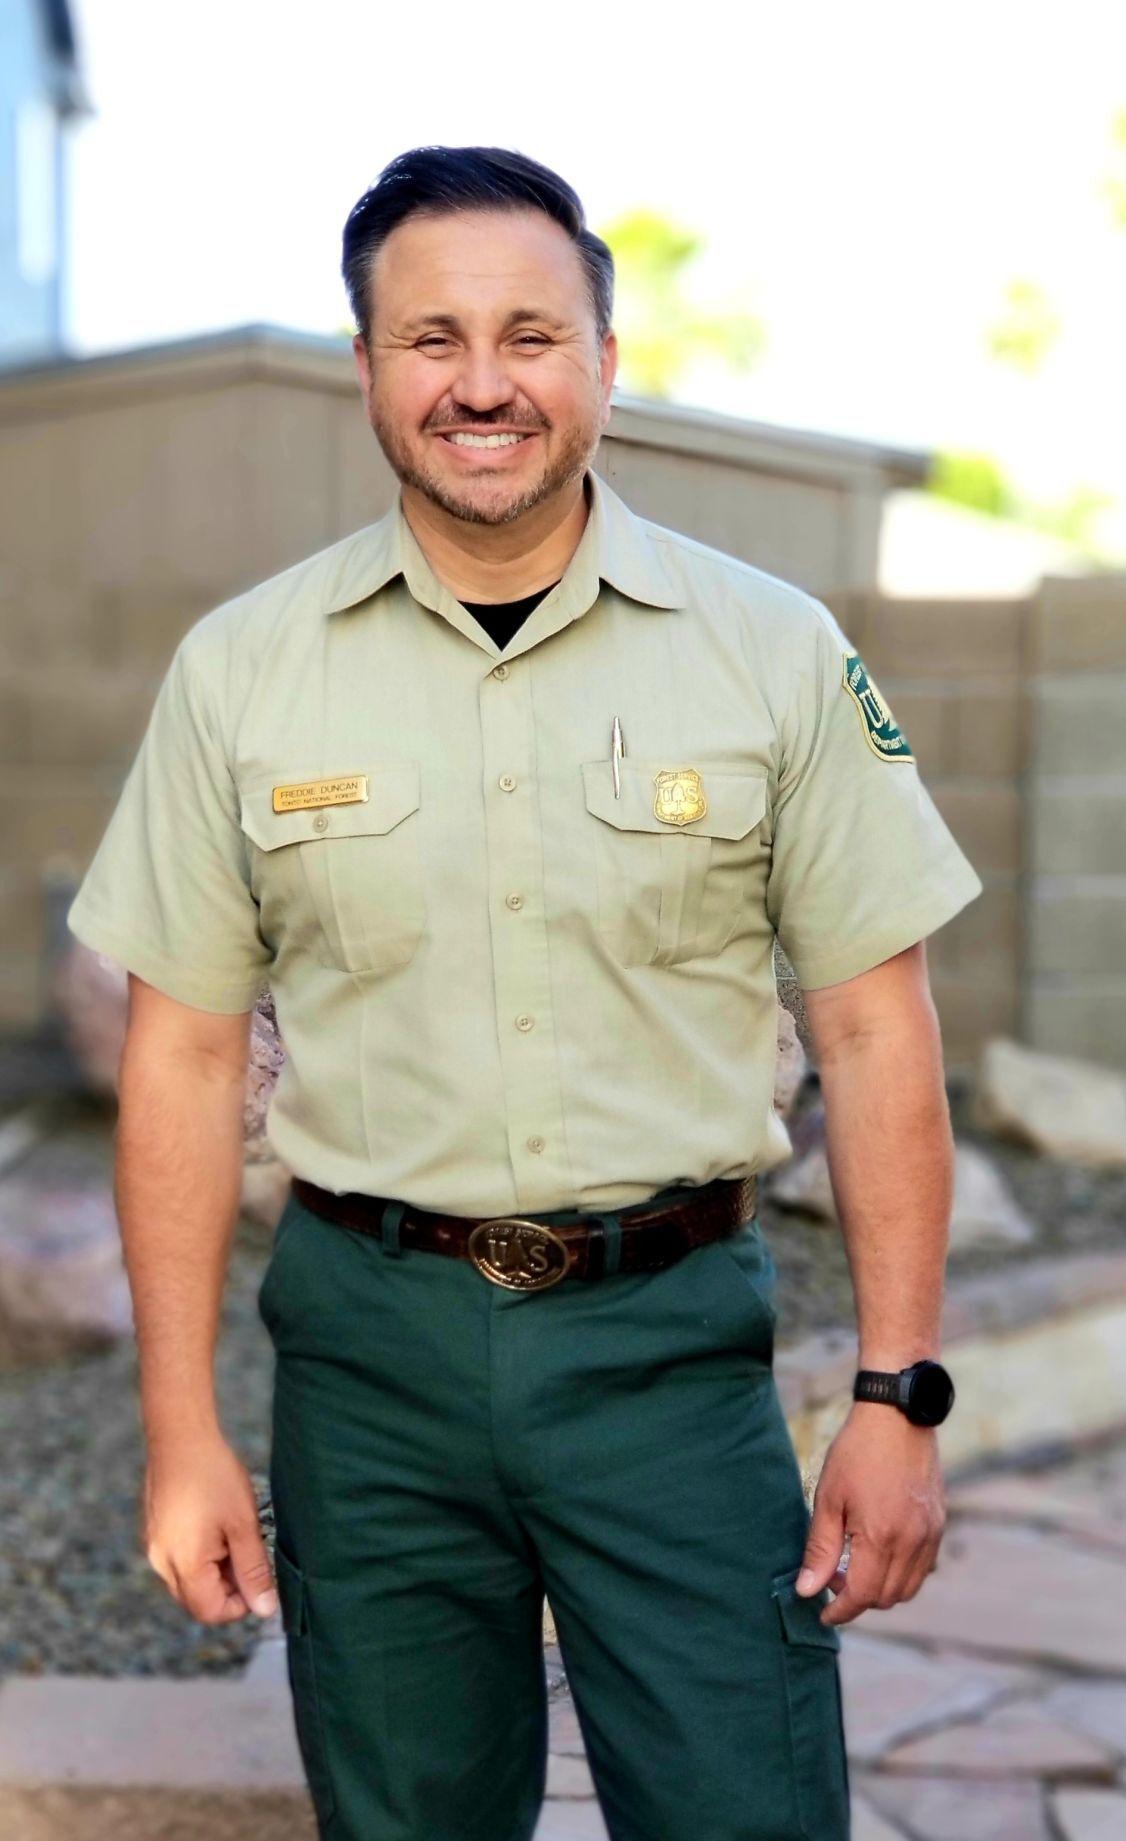 Payson/Pleasant Valley gains new deputy ranger